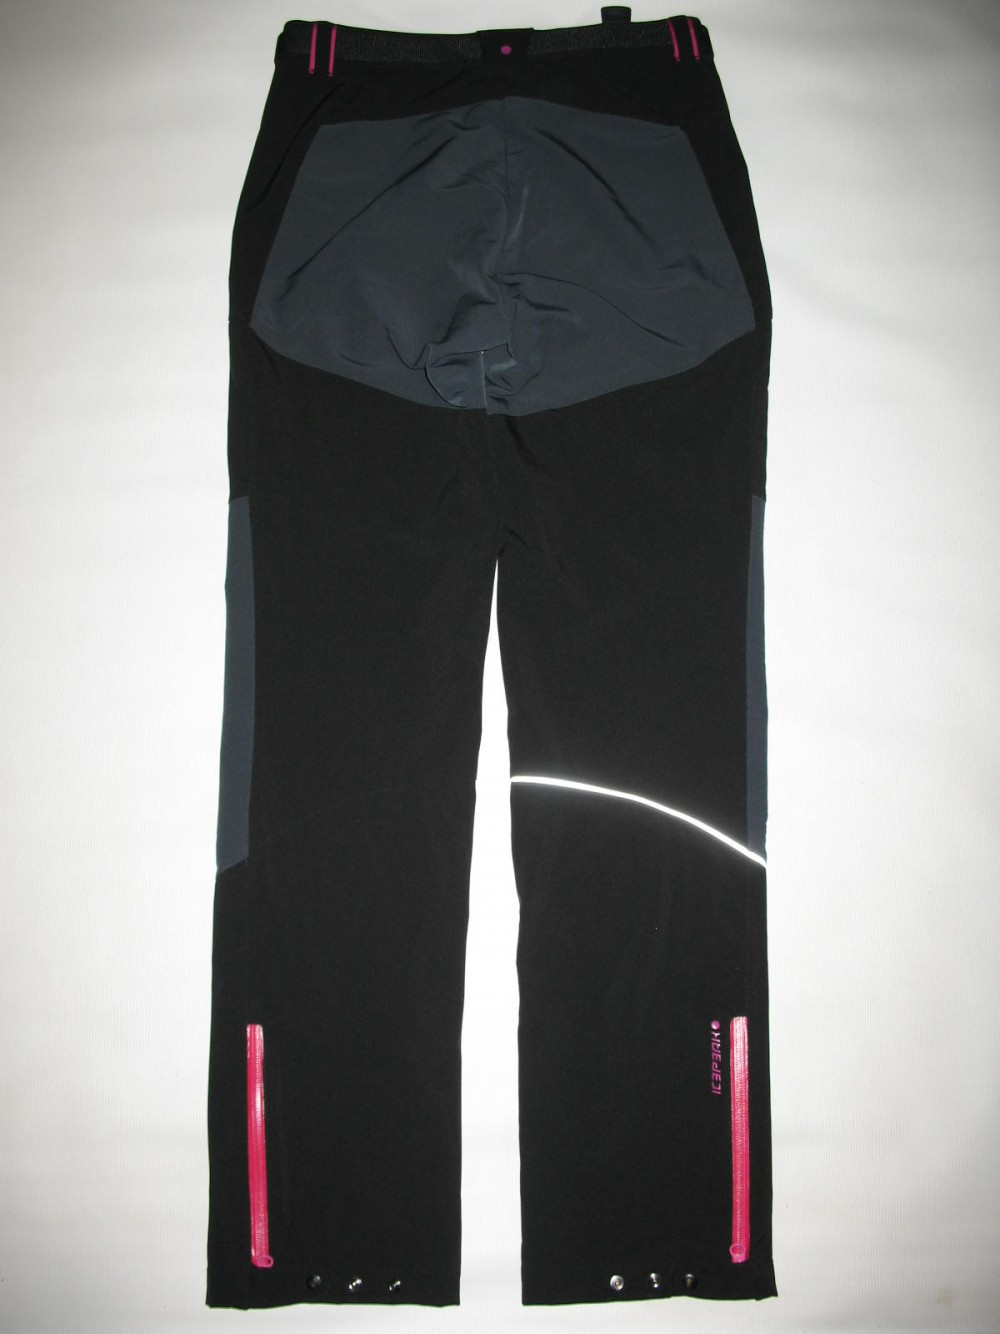 Штаны ICEPEAK softshell pants lady (размер 38-M/S) - 2